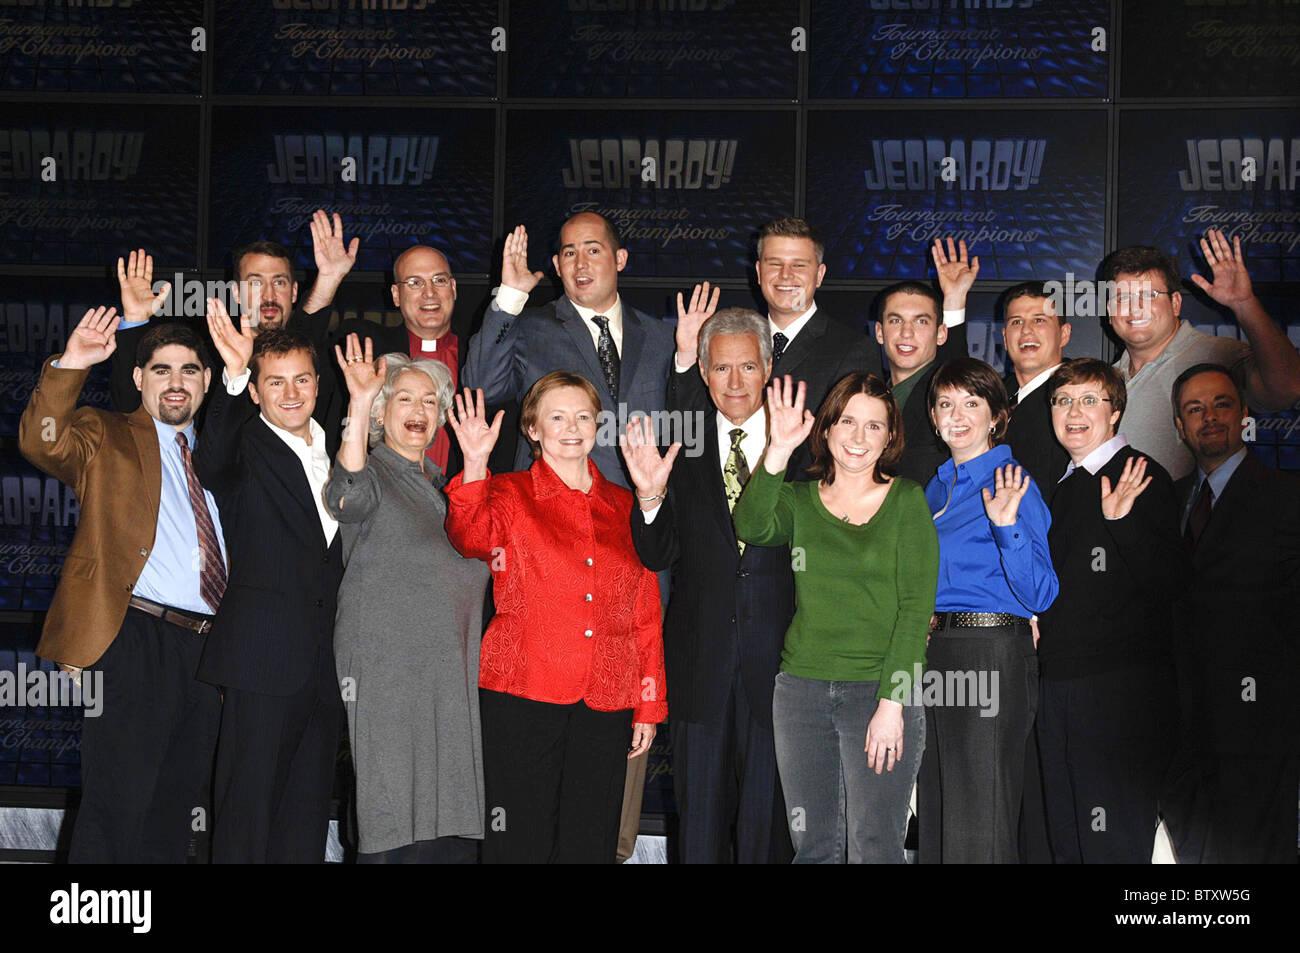 THU - Consumer Electronics Show Celebrity Appearances Stock Photo